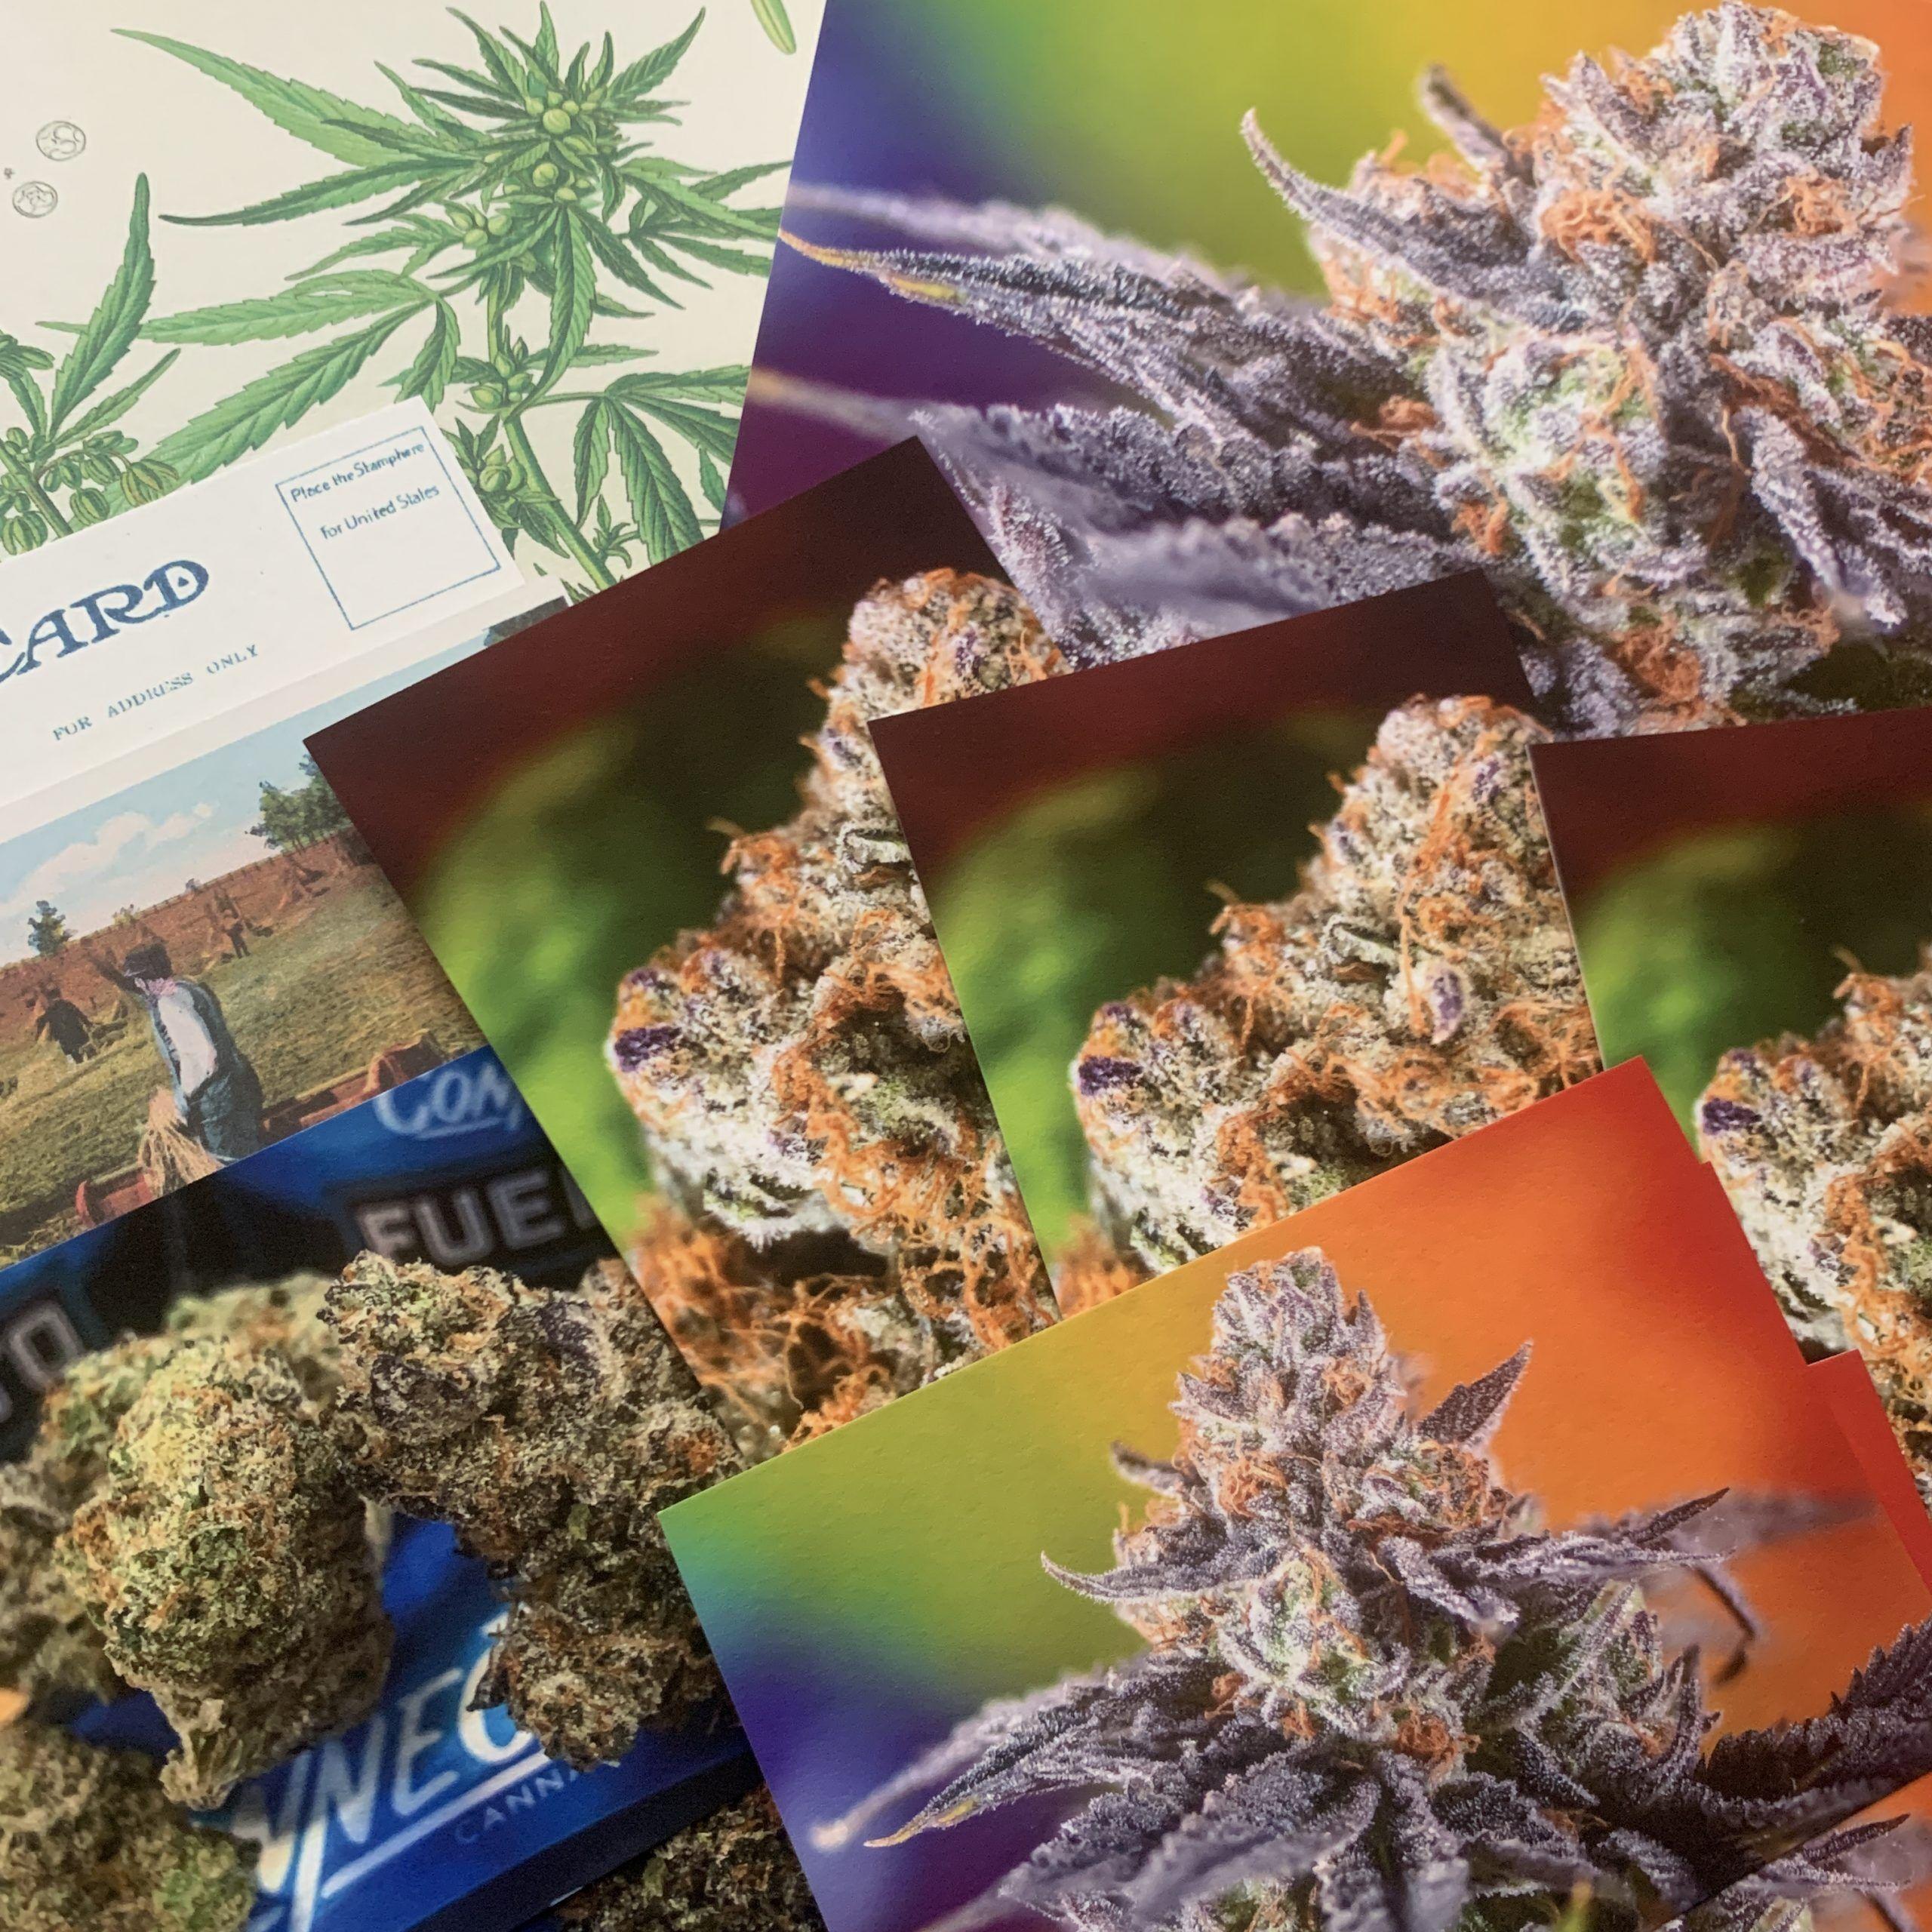 hemp fine art prints, cannabis photography, prize packs, hemp paper prints, custom hemp prints catalog archive